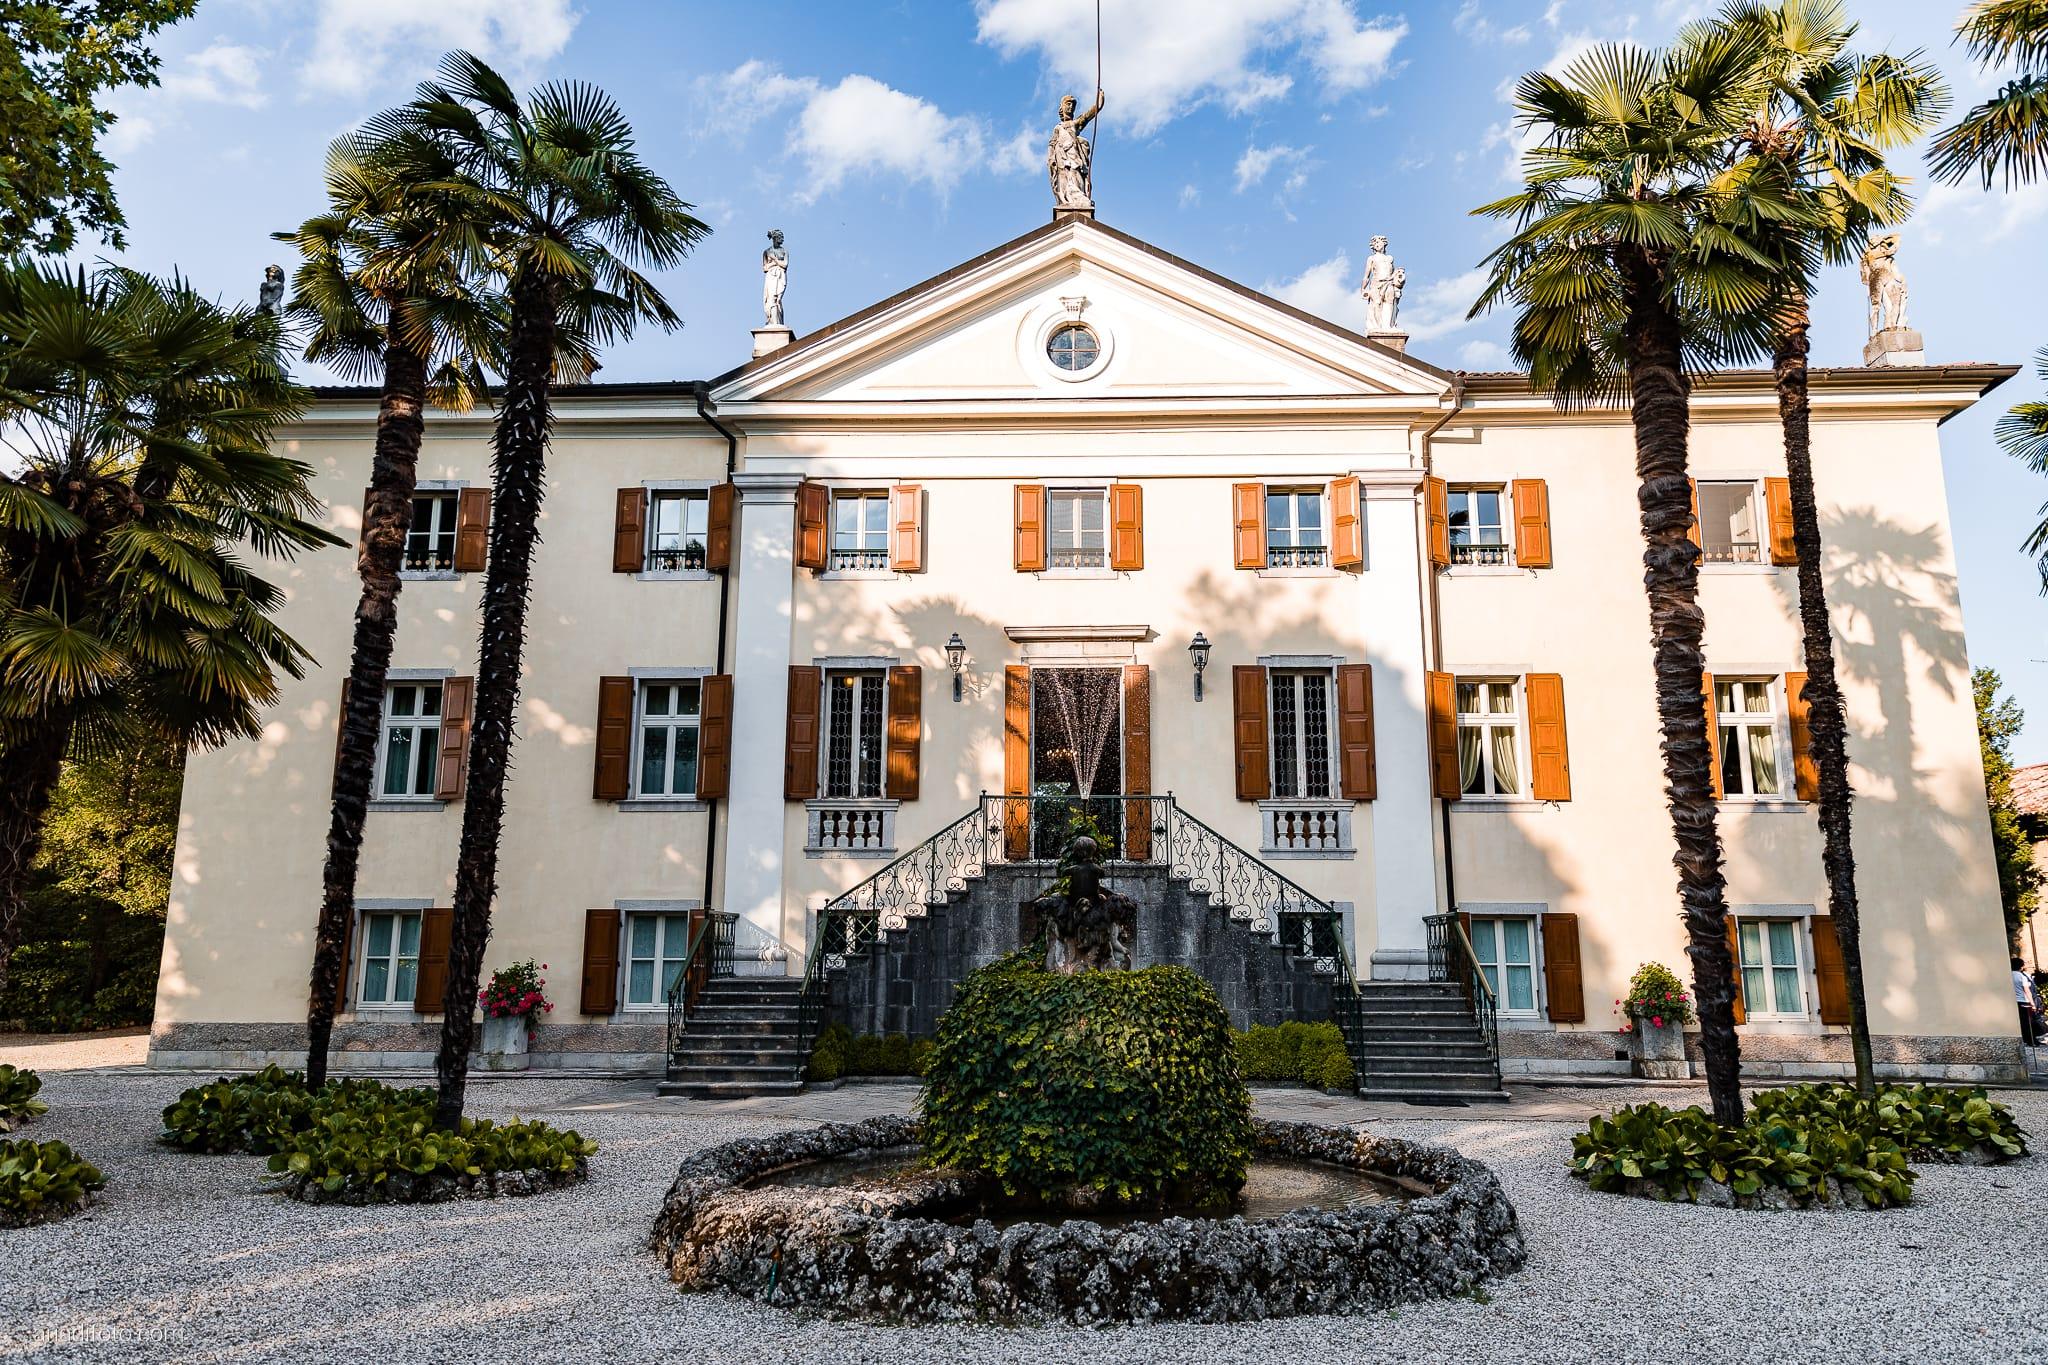 Lavinia Daniele Matrimonio Medea Gorizia Villa Elodia Trivignano Udinese Udine ricevimento location